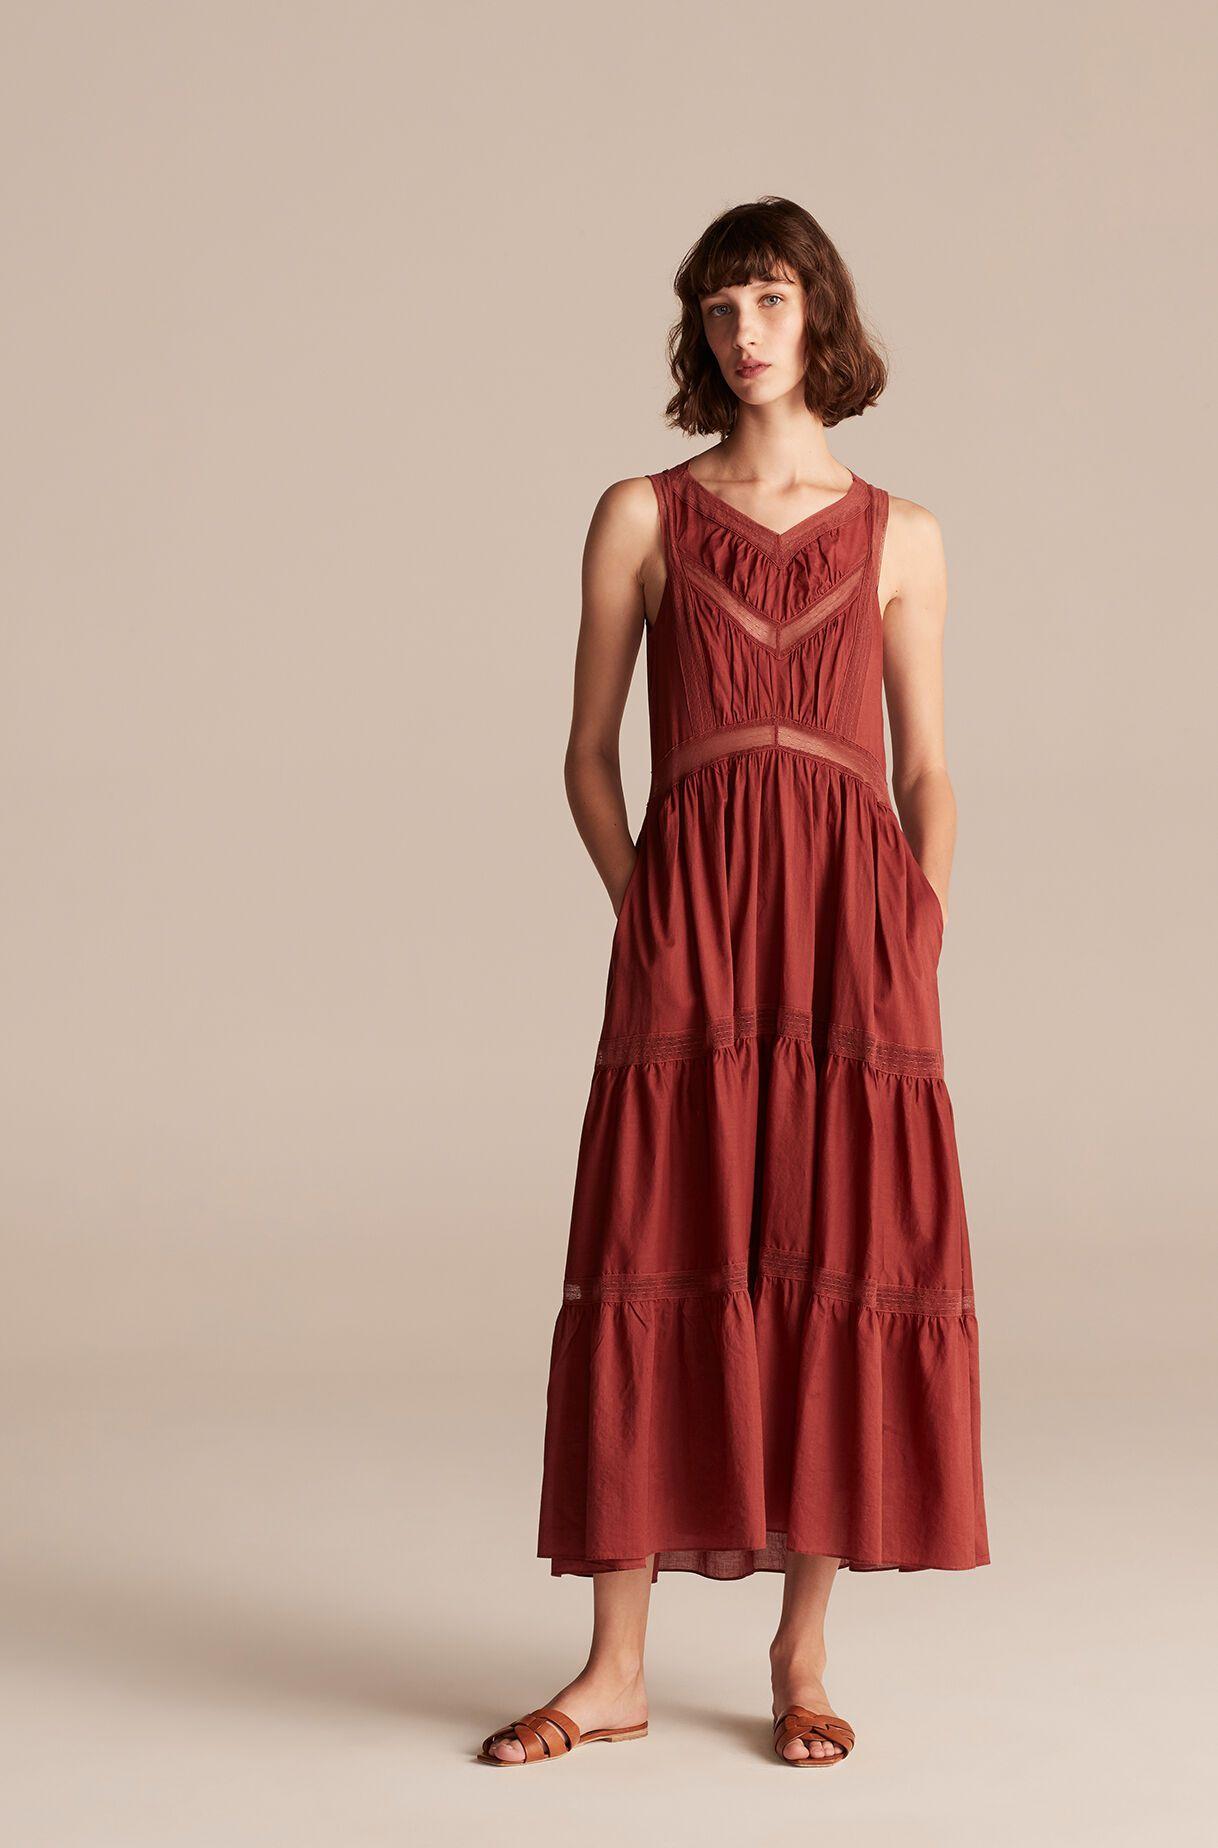 Rebecca Taylor La Vie Voile Lace Trim Dress $140 (originally $350)